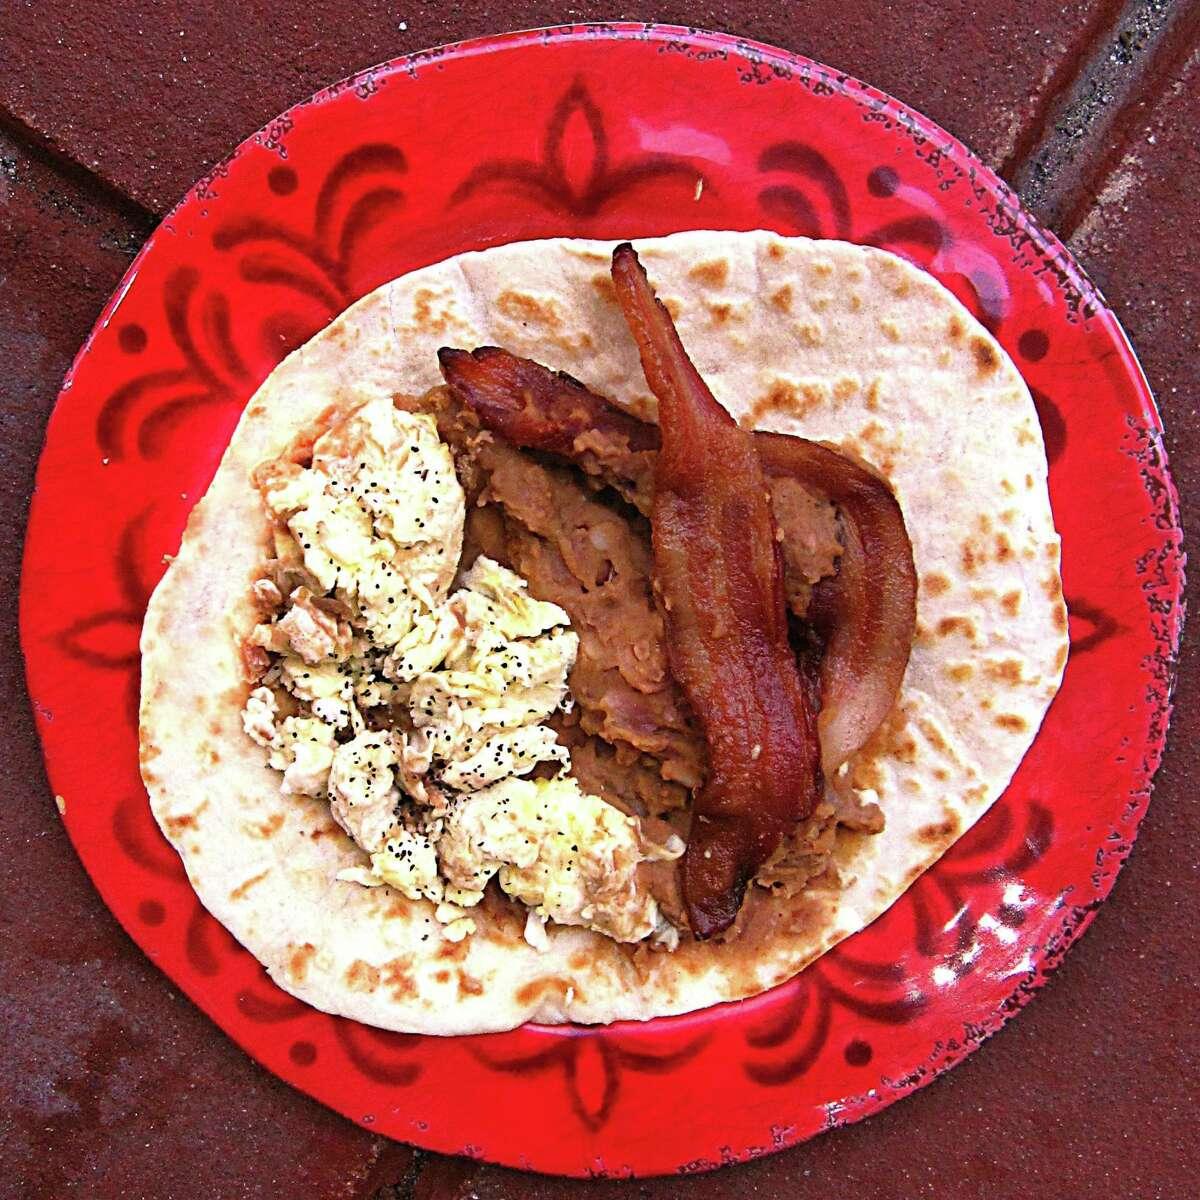 Bacon, egg and bean taco on a handmade flour tortilla from Eddie's Taco House.